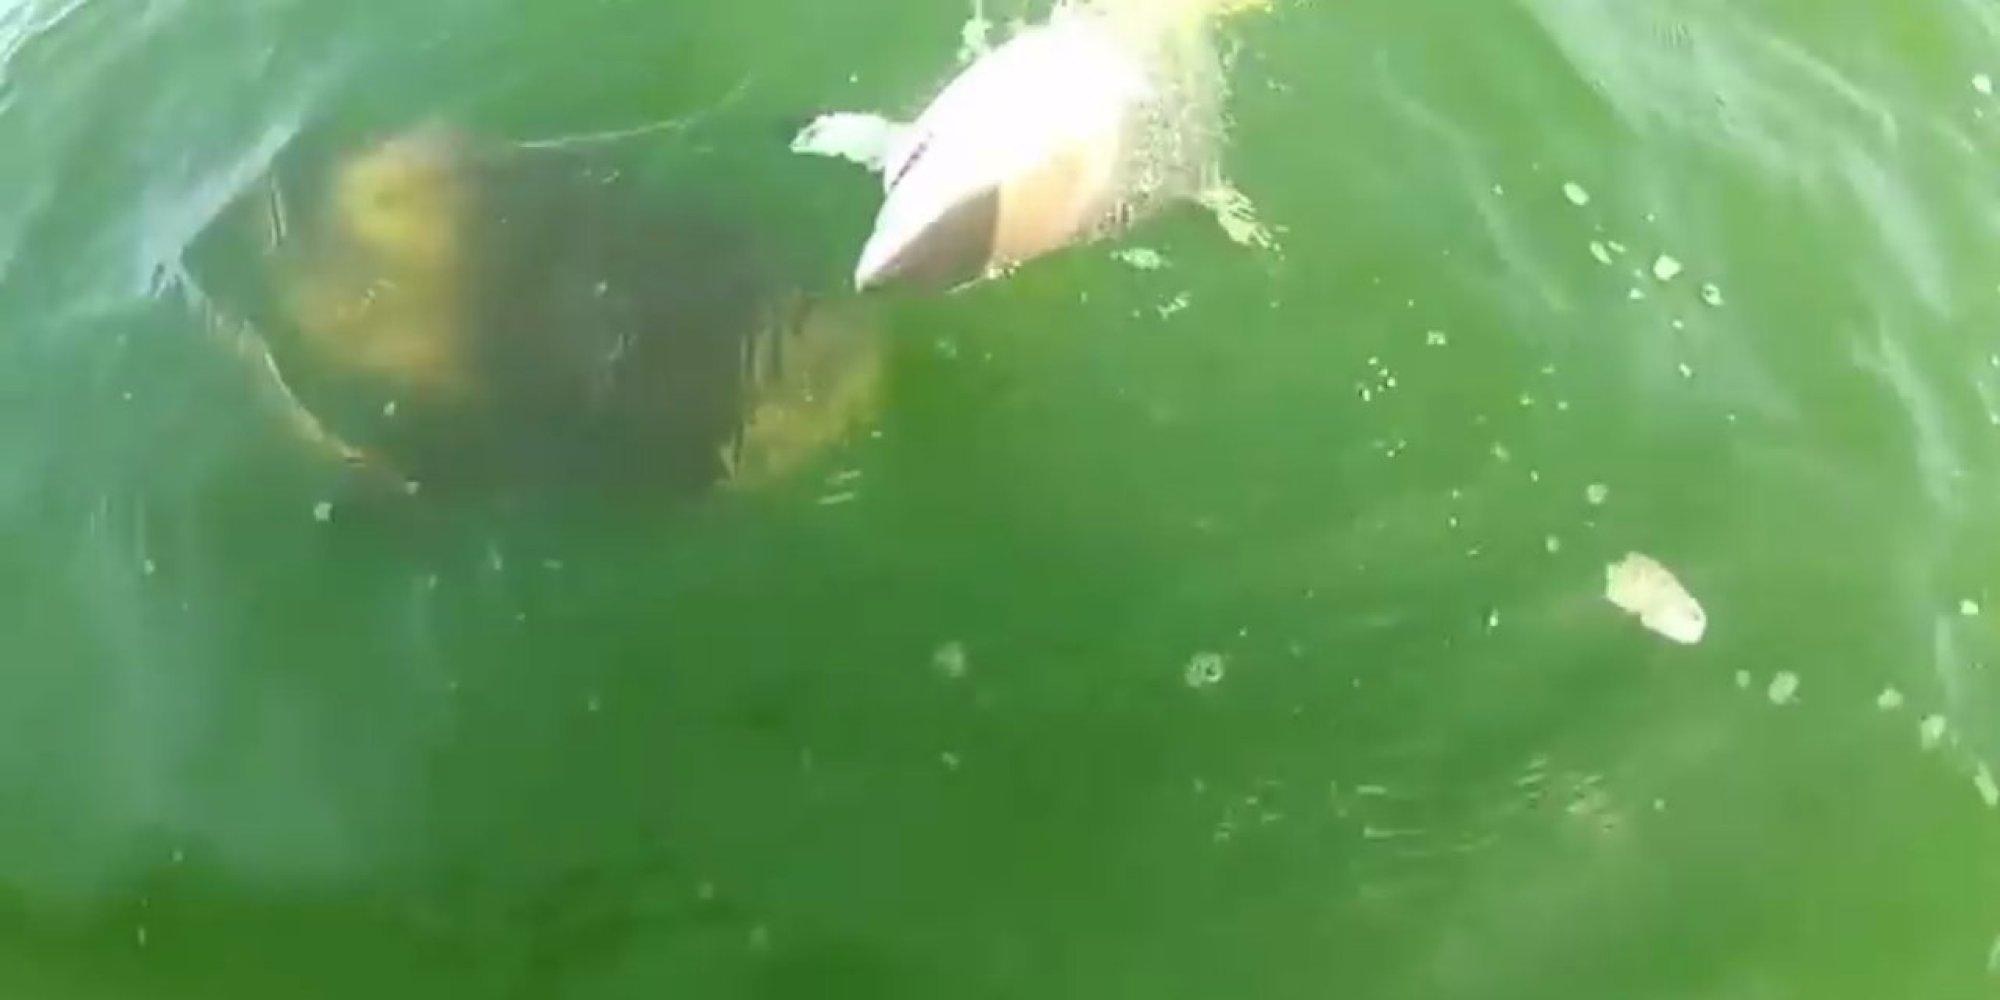 Goliath Grouper Eats Shark Massive Fish Devours 4...